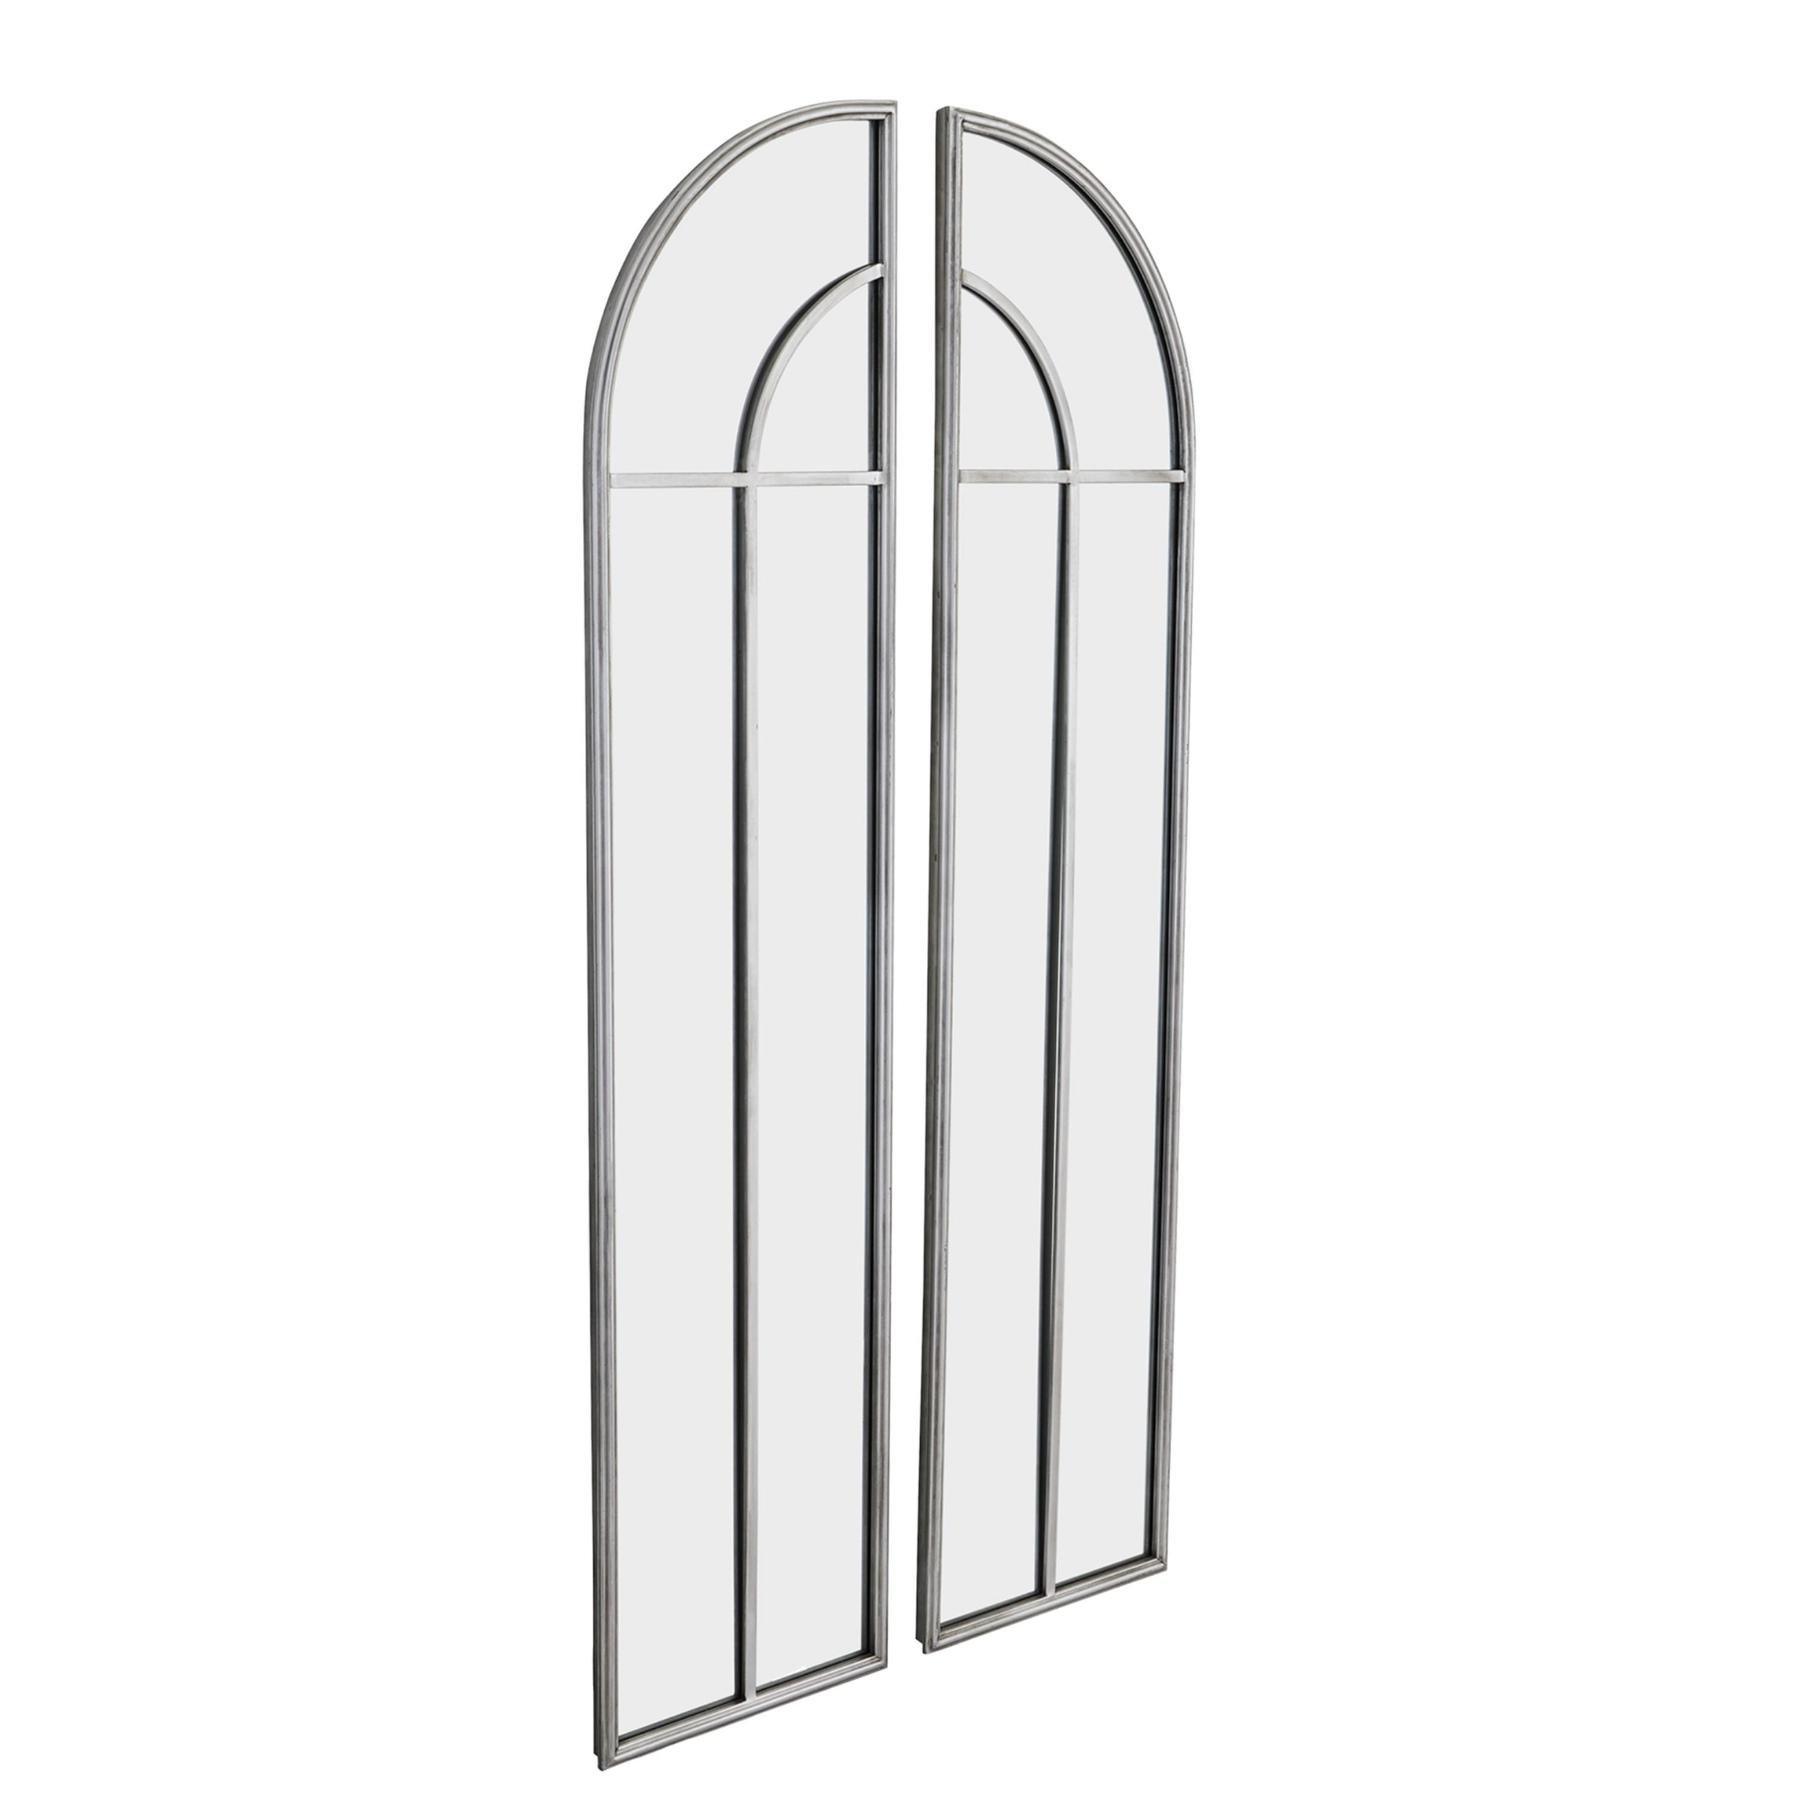 Antique Silver Arch Window Mirror Set - Image 1